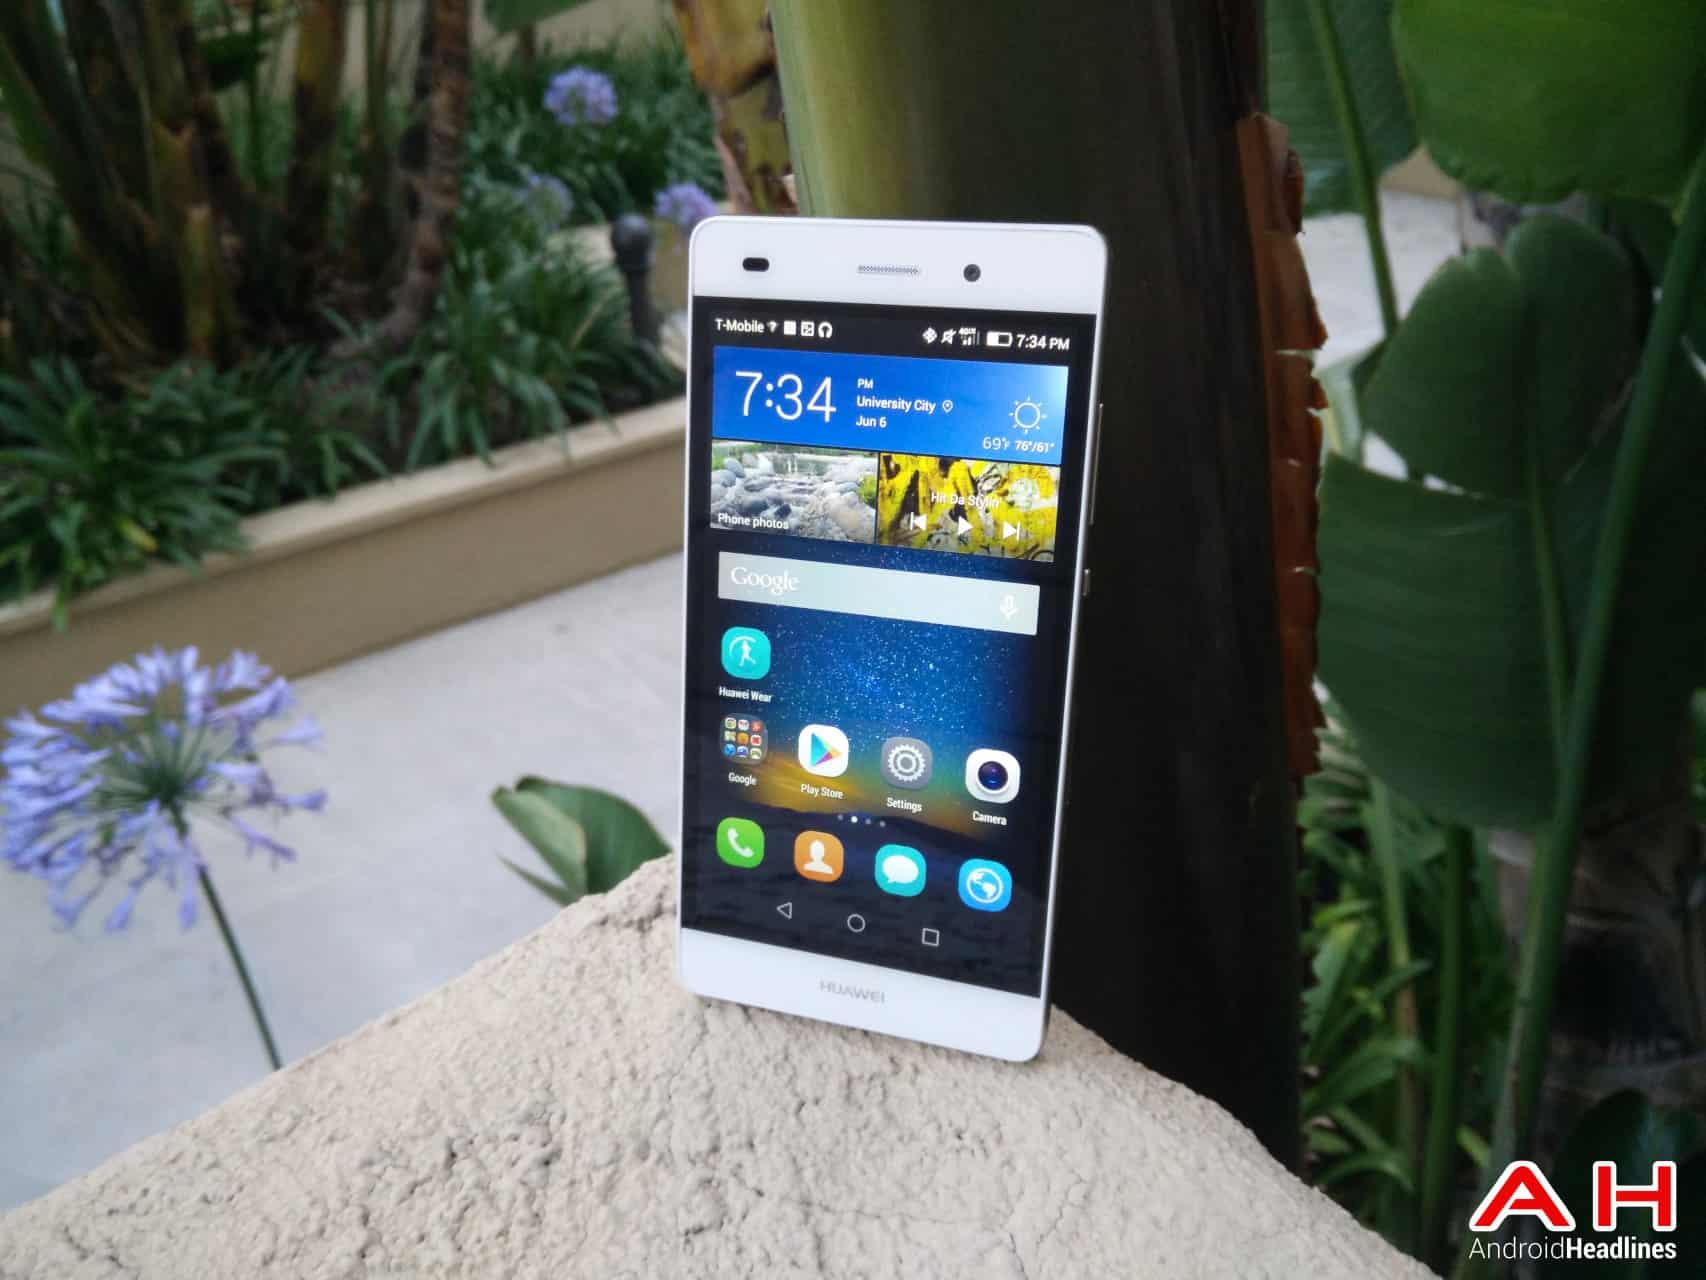 Huawei P8 Lite AH 01-2